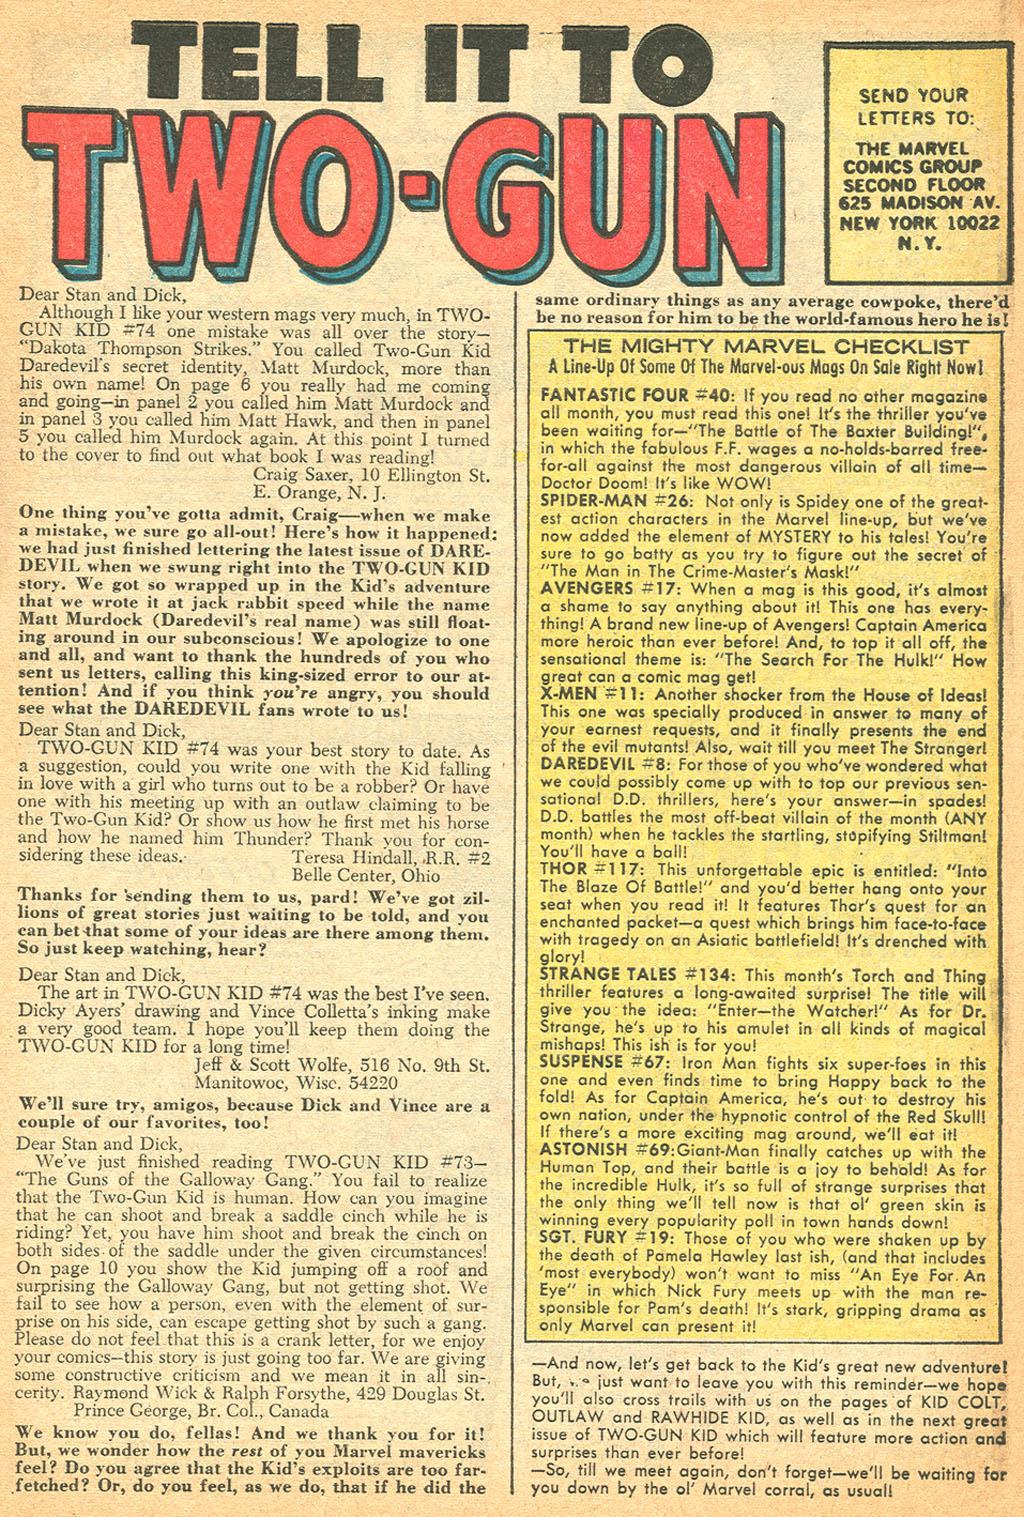 Read online Two-Gun Kid comic -  Issue #76 - 7